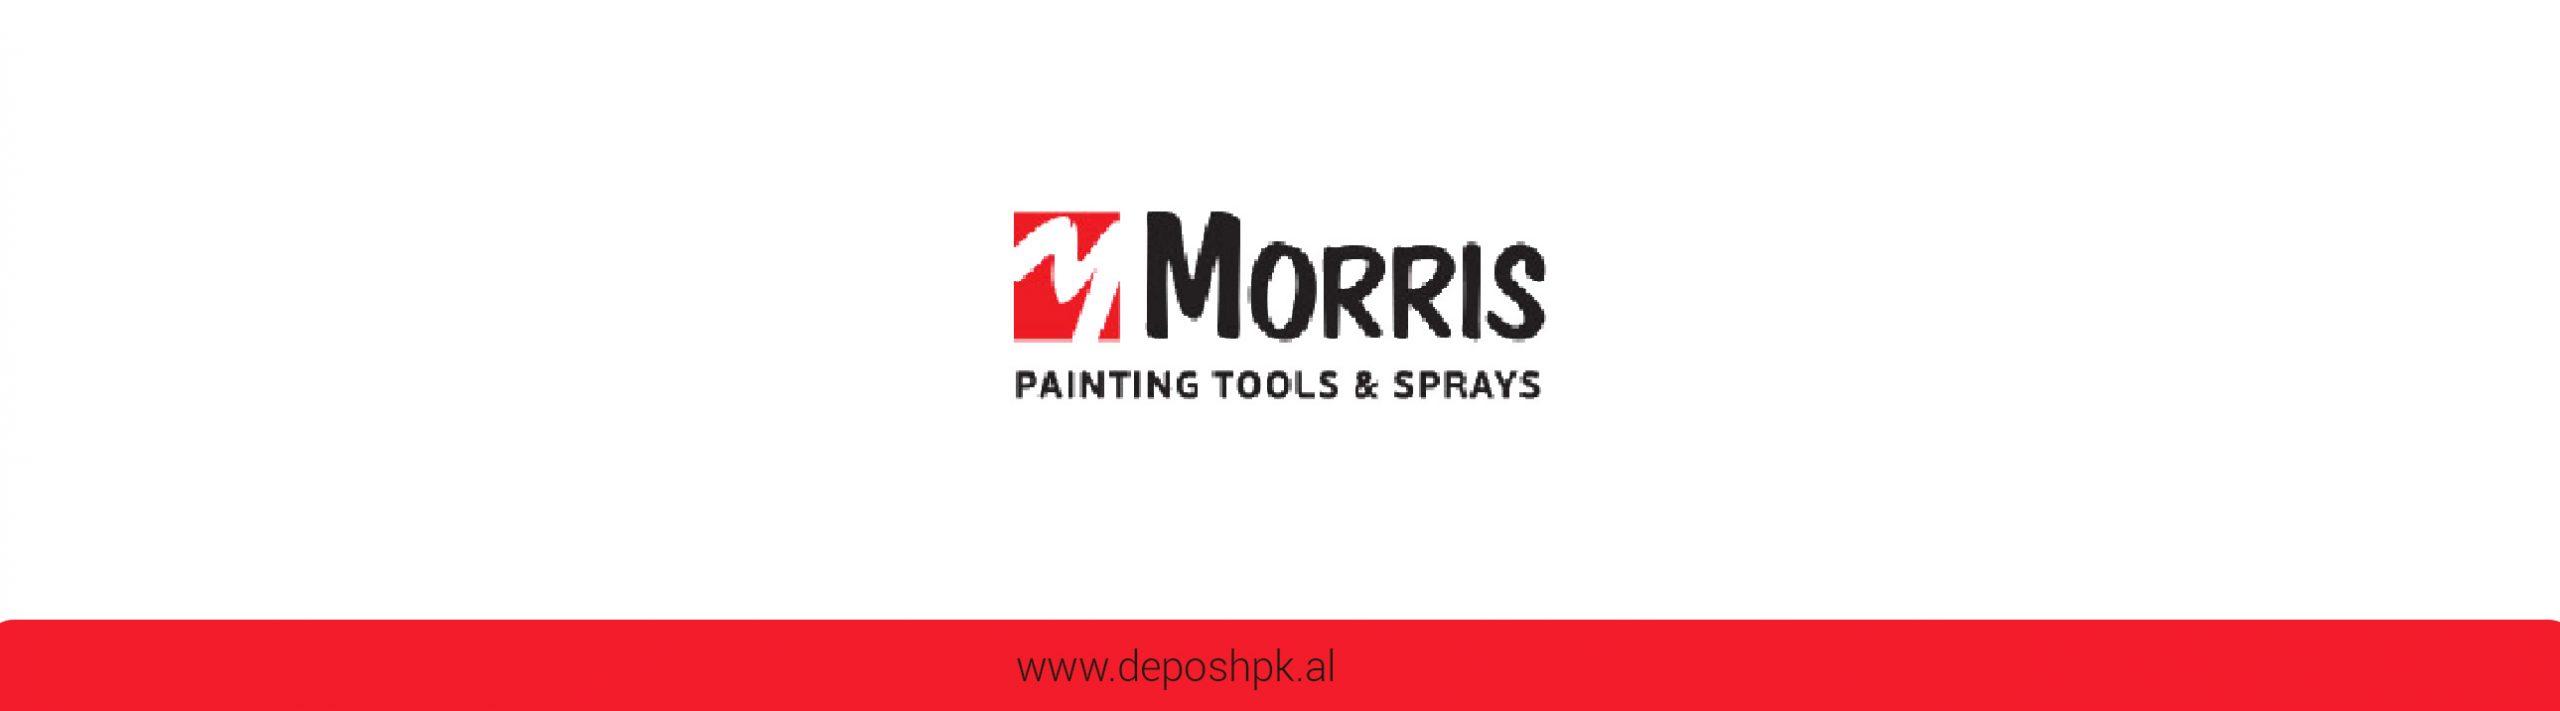 https://www.deposhpk.al/wp-content/uploads/2019/12/morris-produkt-deposhpk.al_-1-scaled.jpg